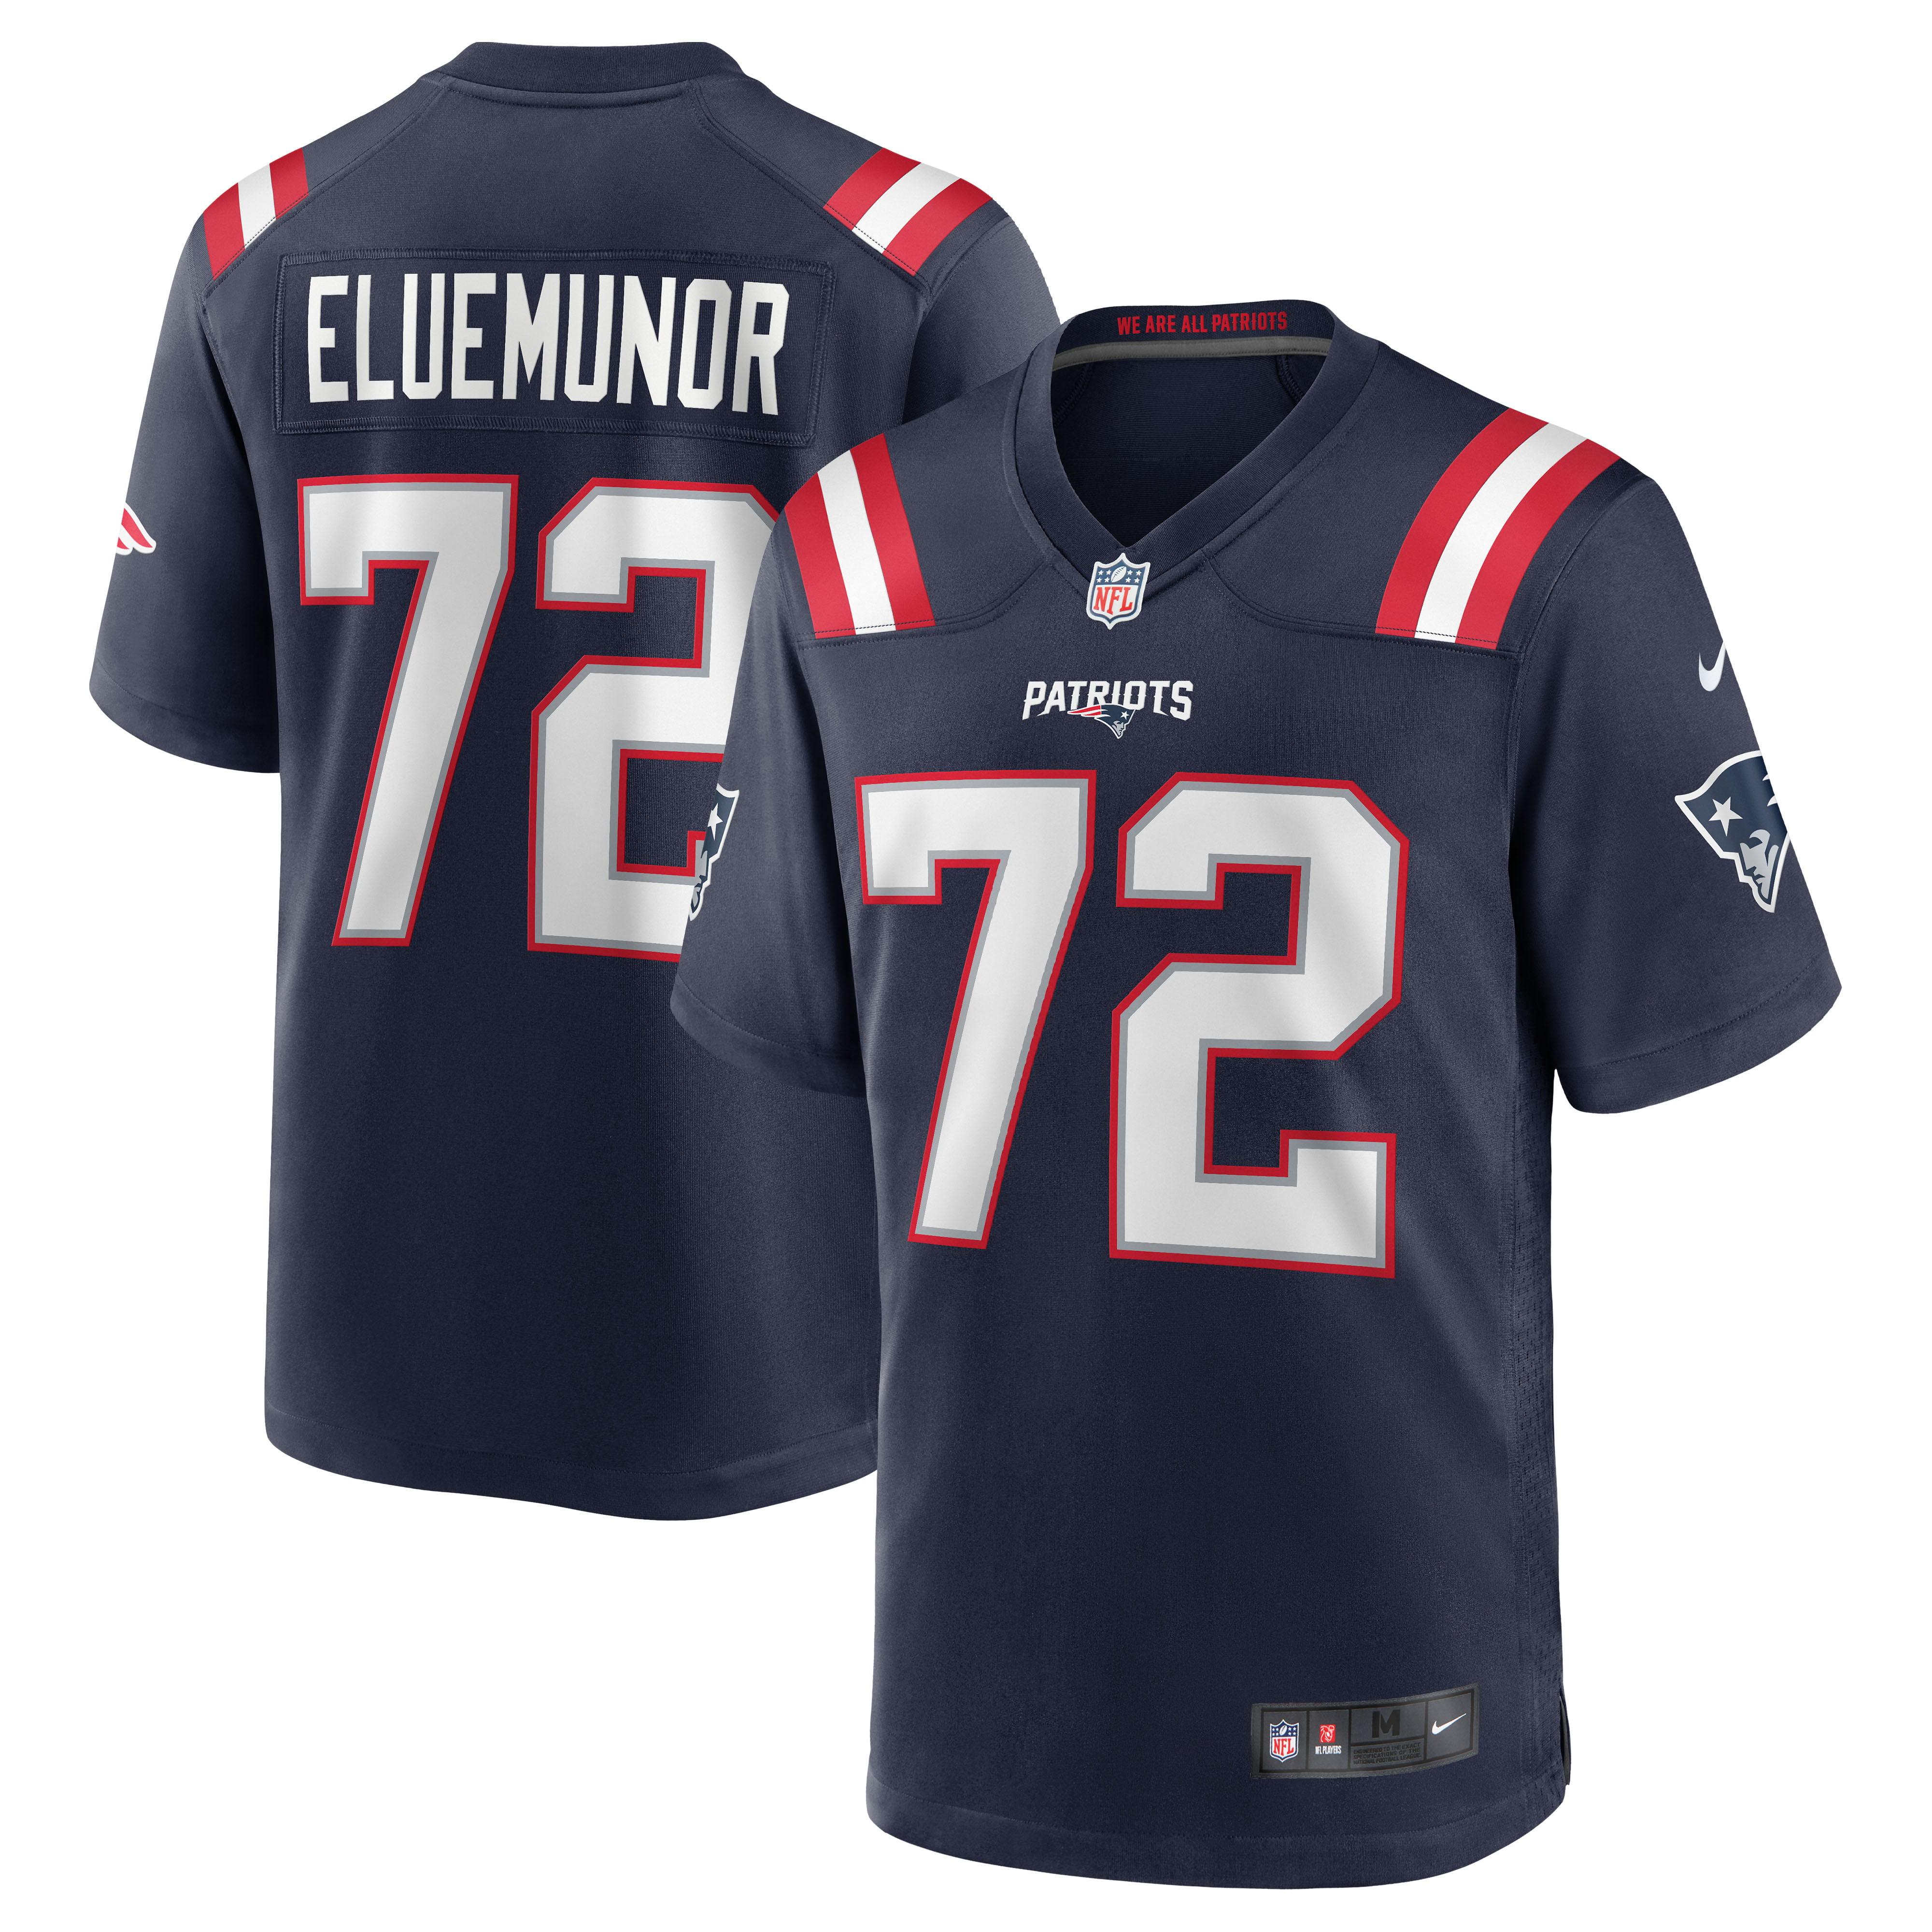 Jermaine Eluemunor New England Patriots Nike Team Game Jersey - Navy - Walmart.com